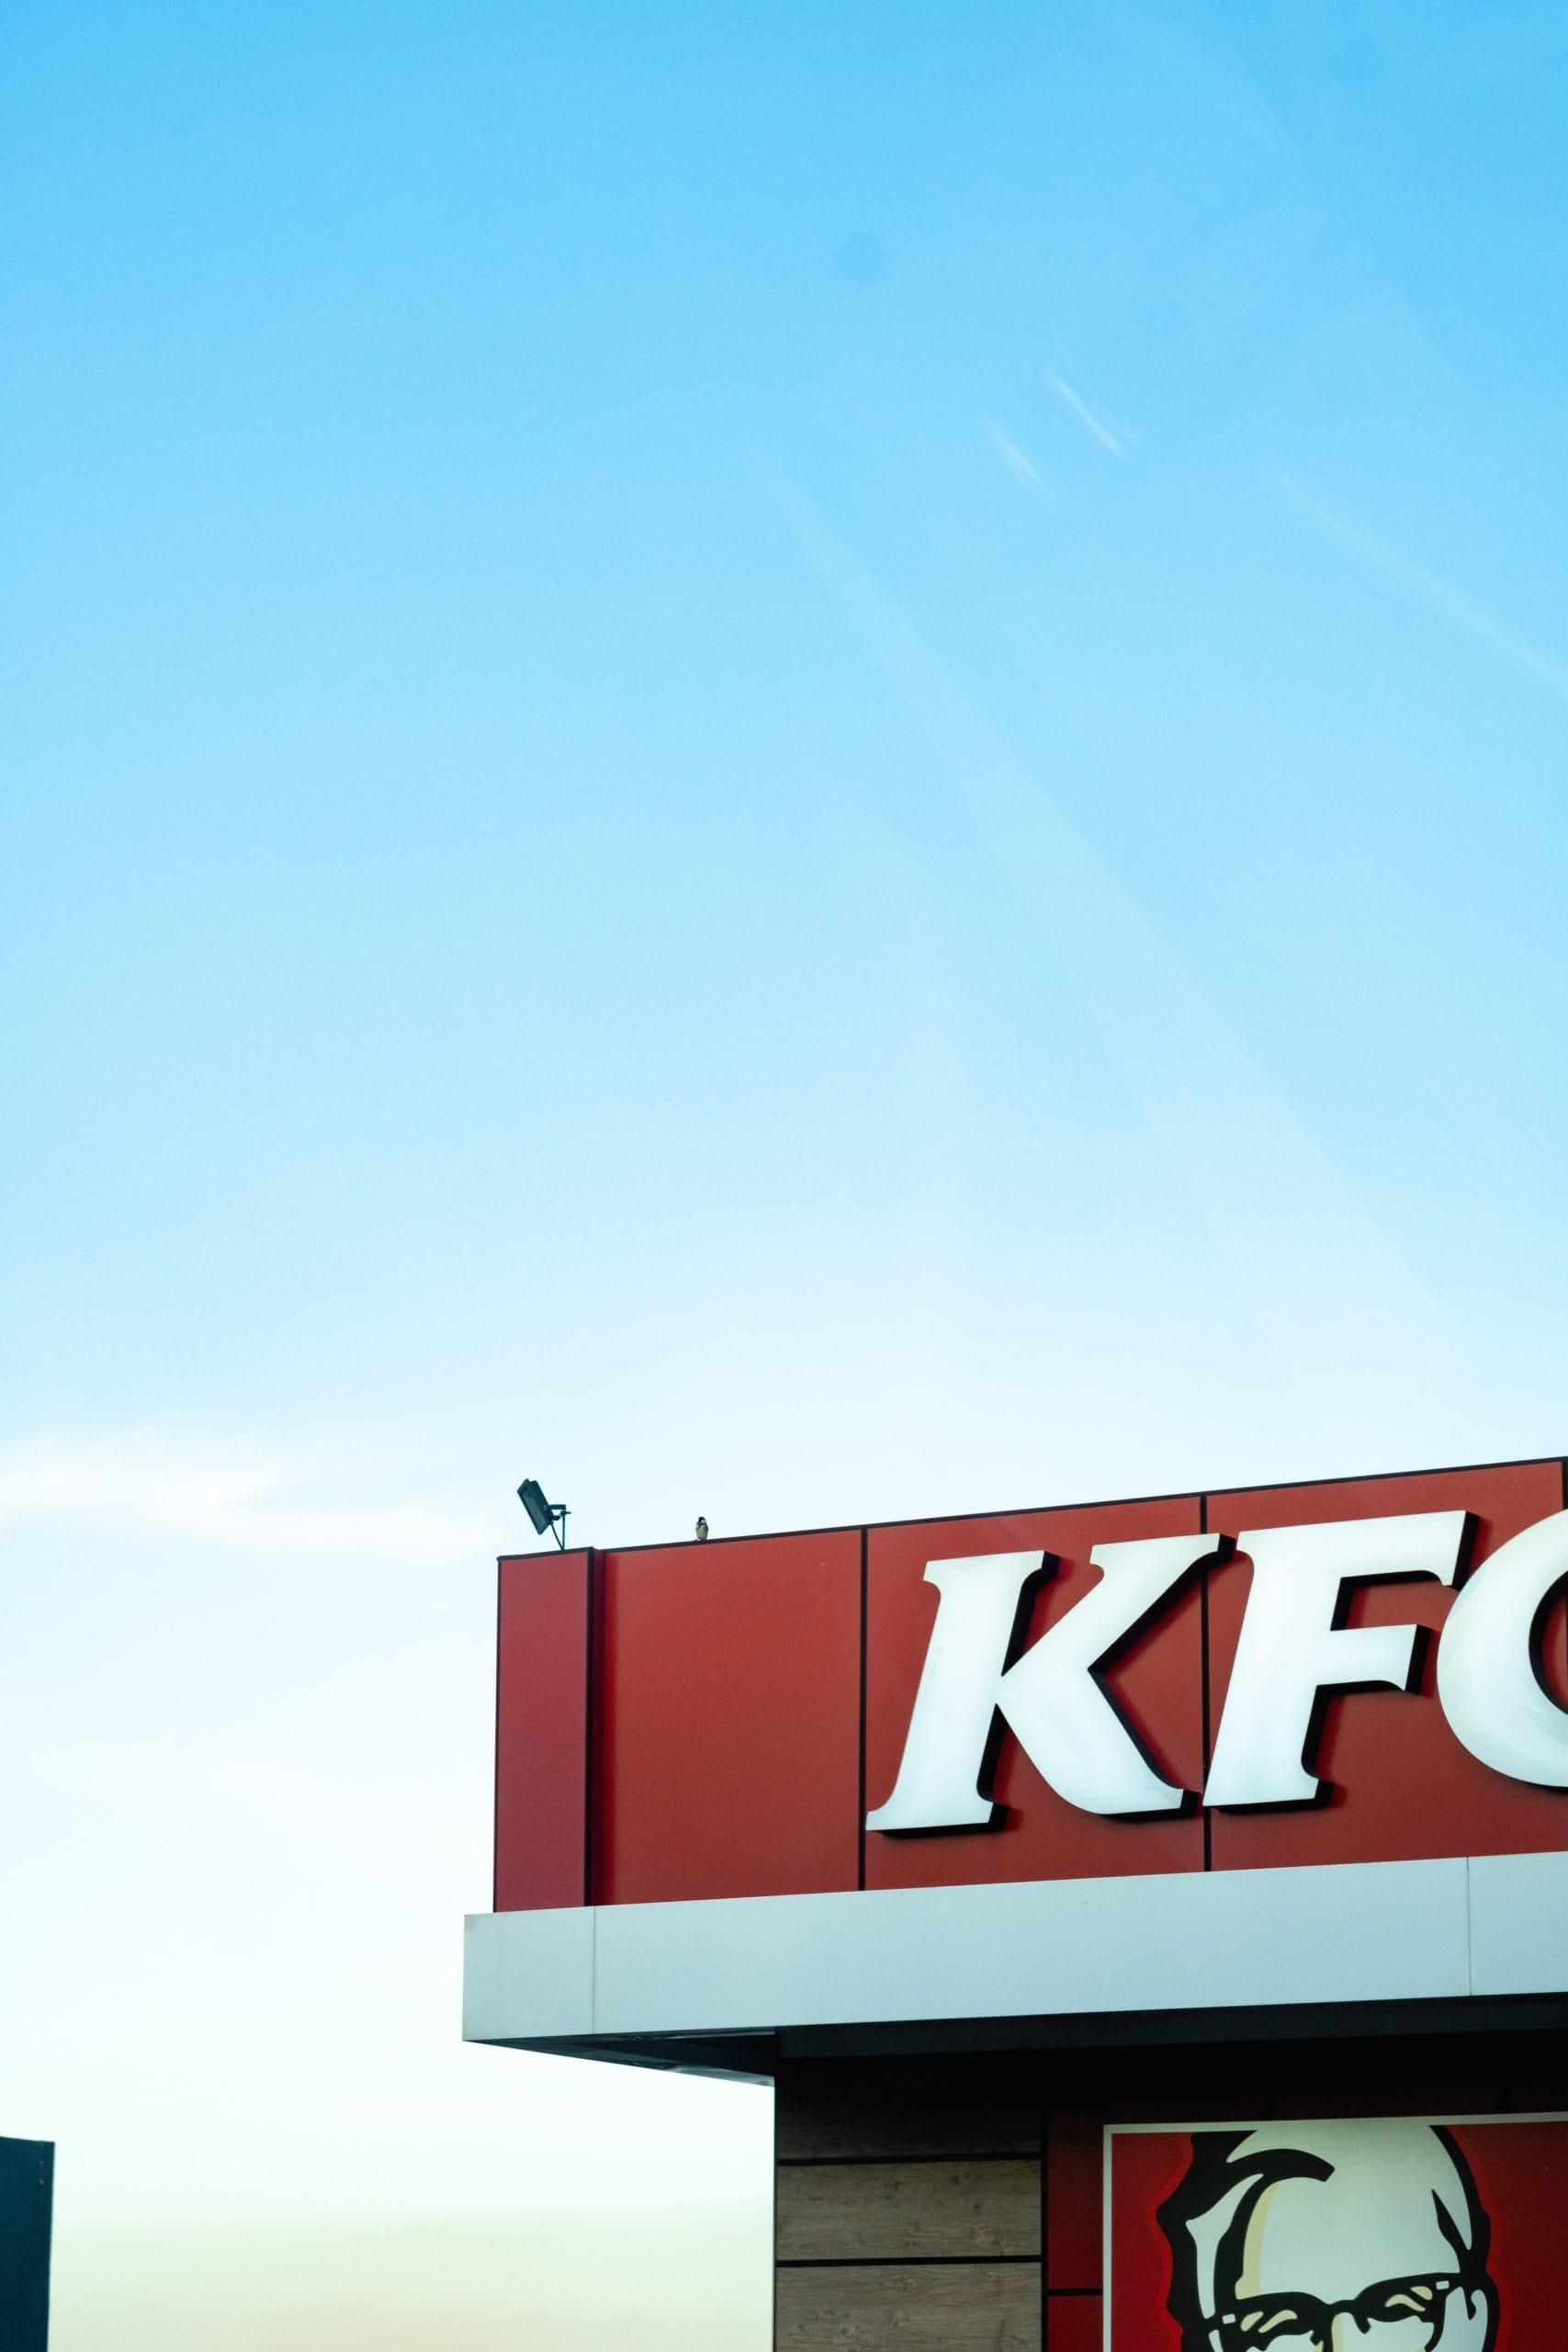 KFC vegan chicken alternative temple of seitan